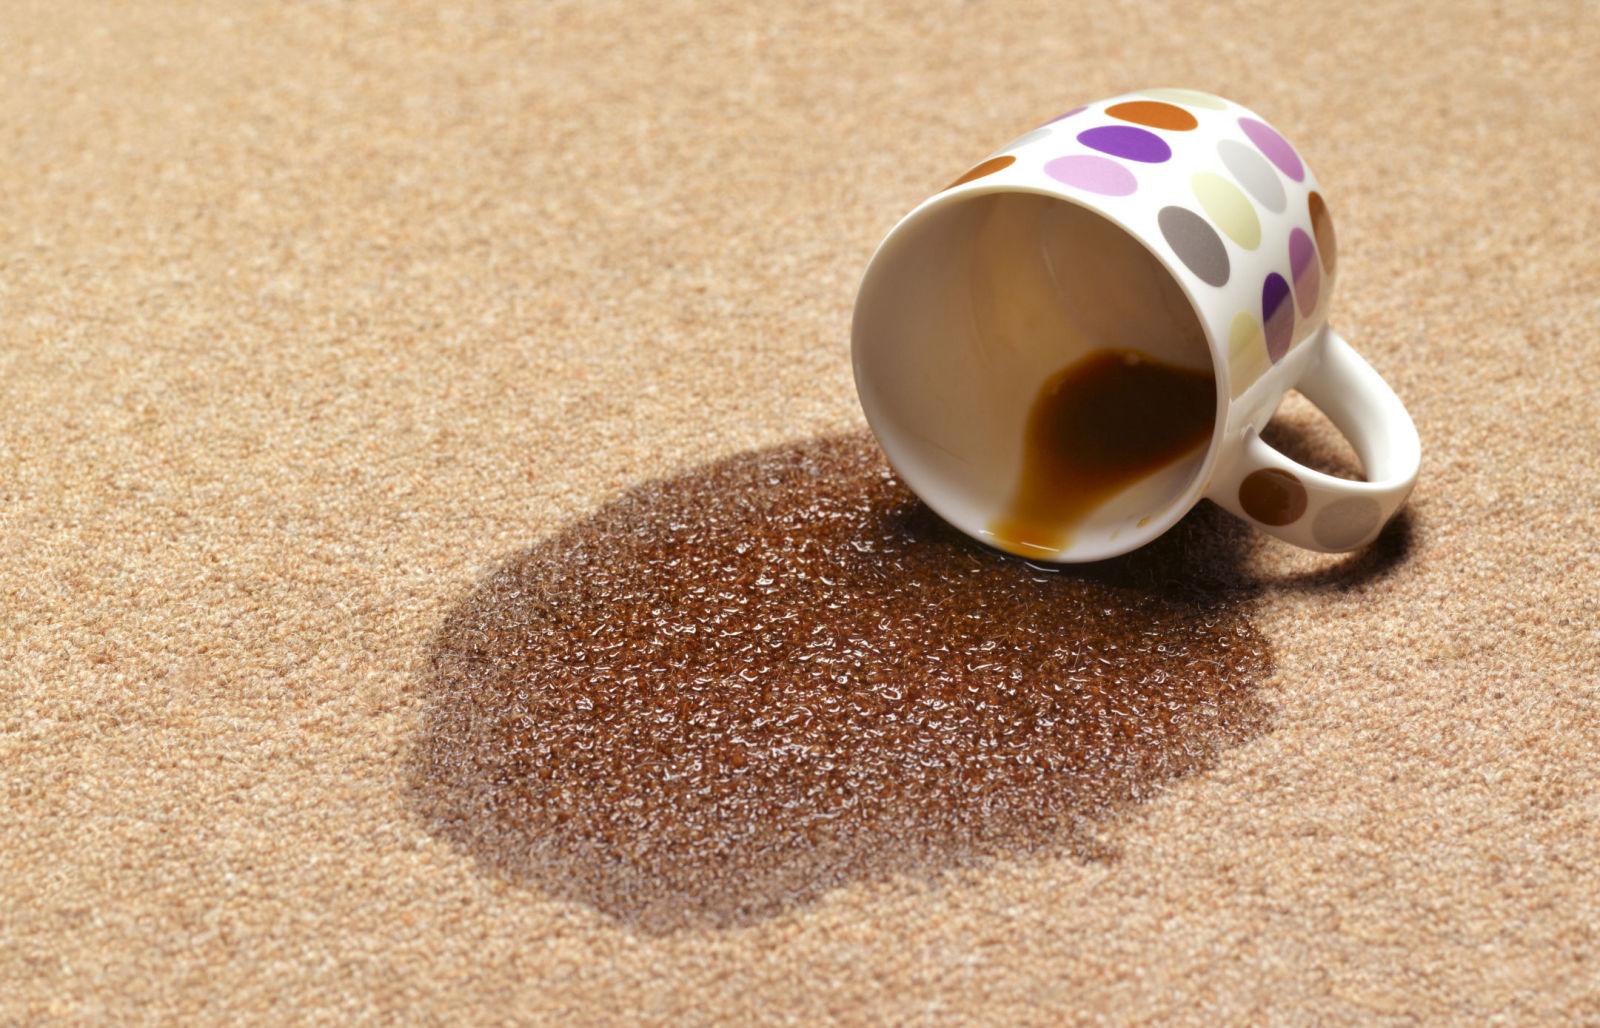 [José Simón Elarba]: Know how to clean coffee stains